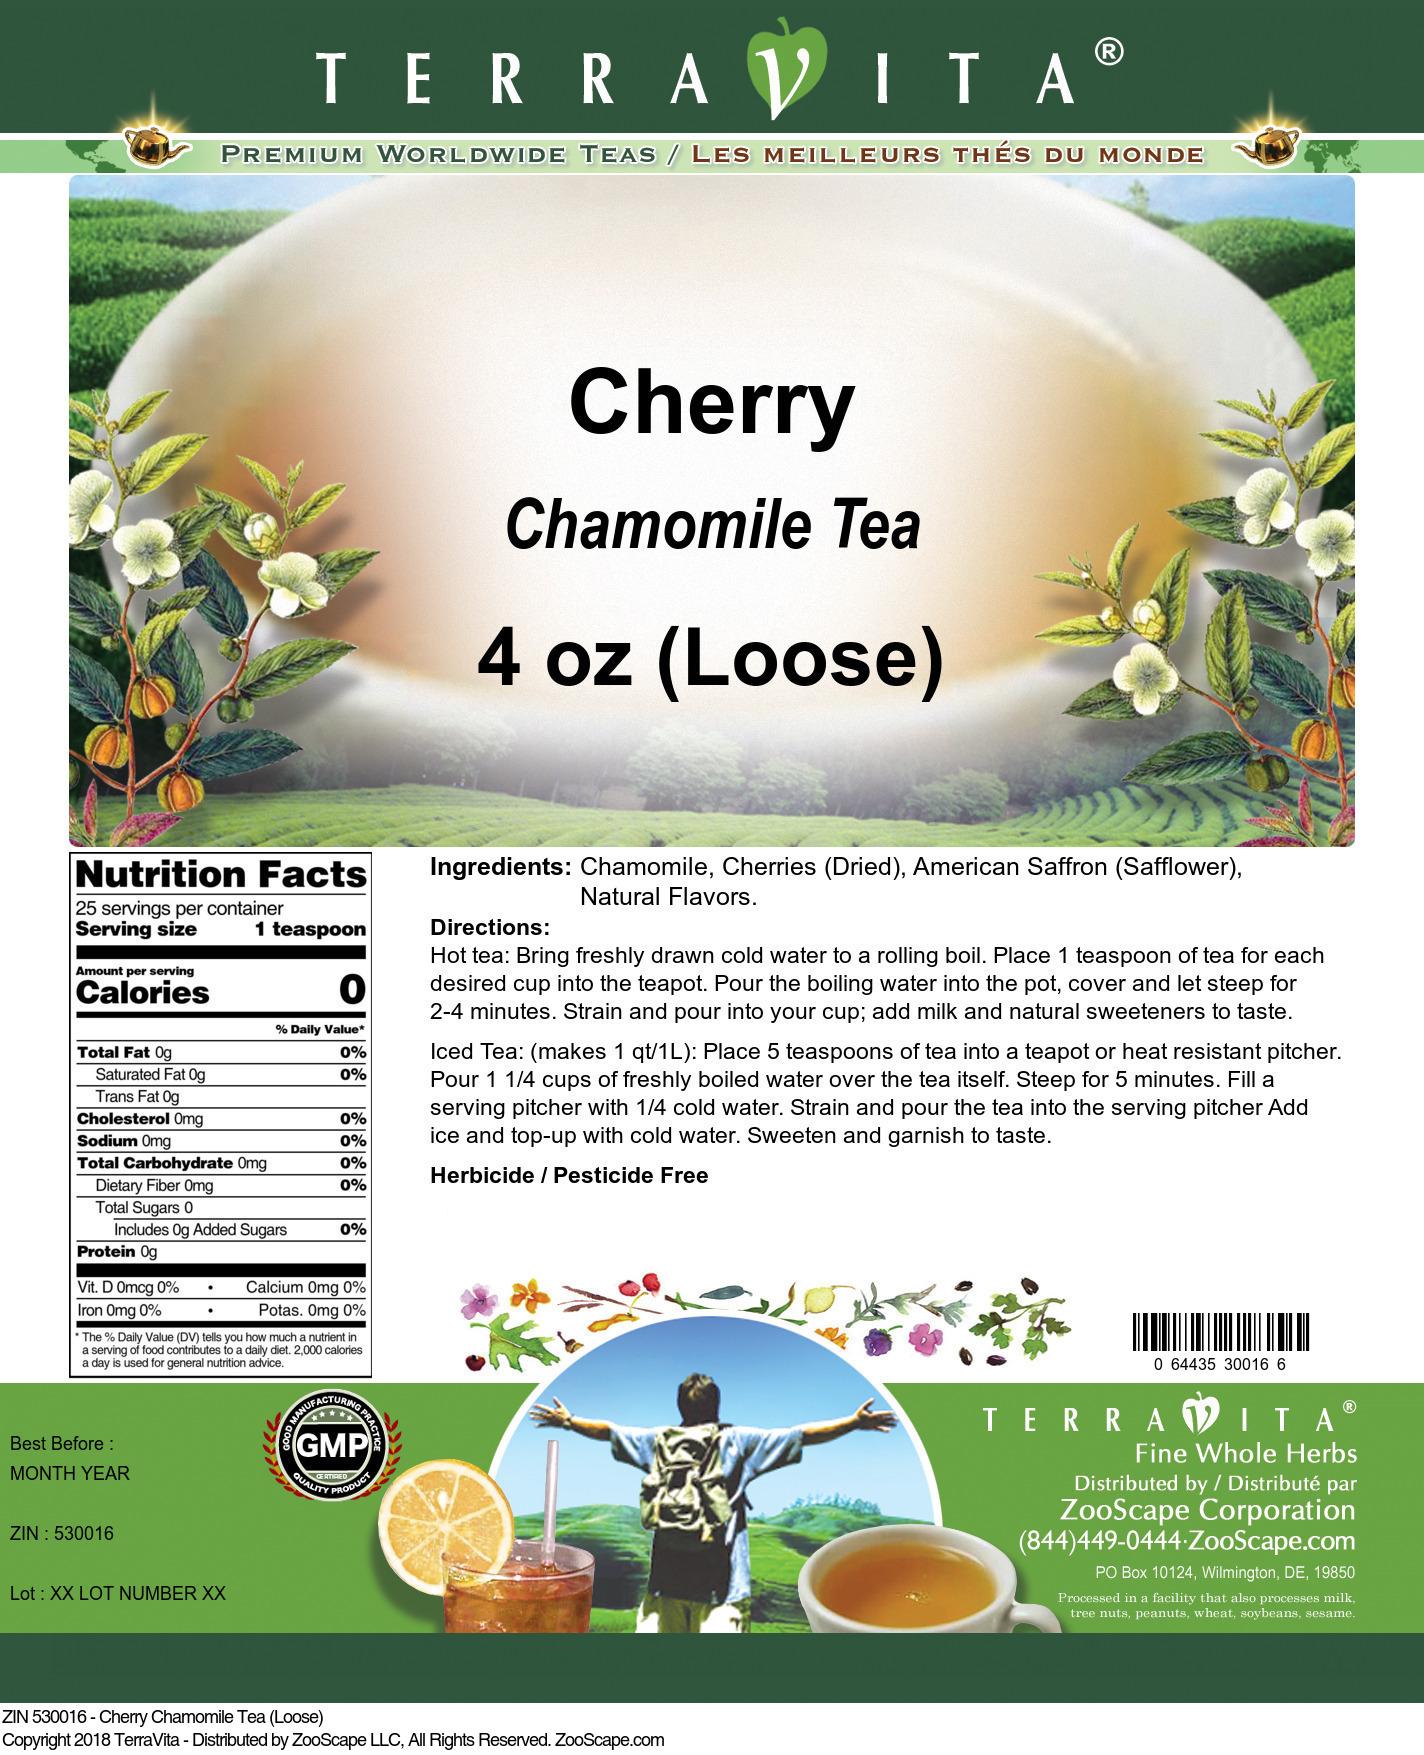 Cherry Chamomile Tea (Loose)